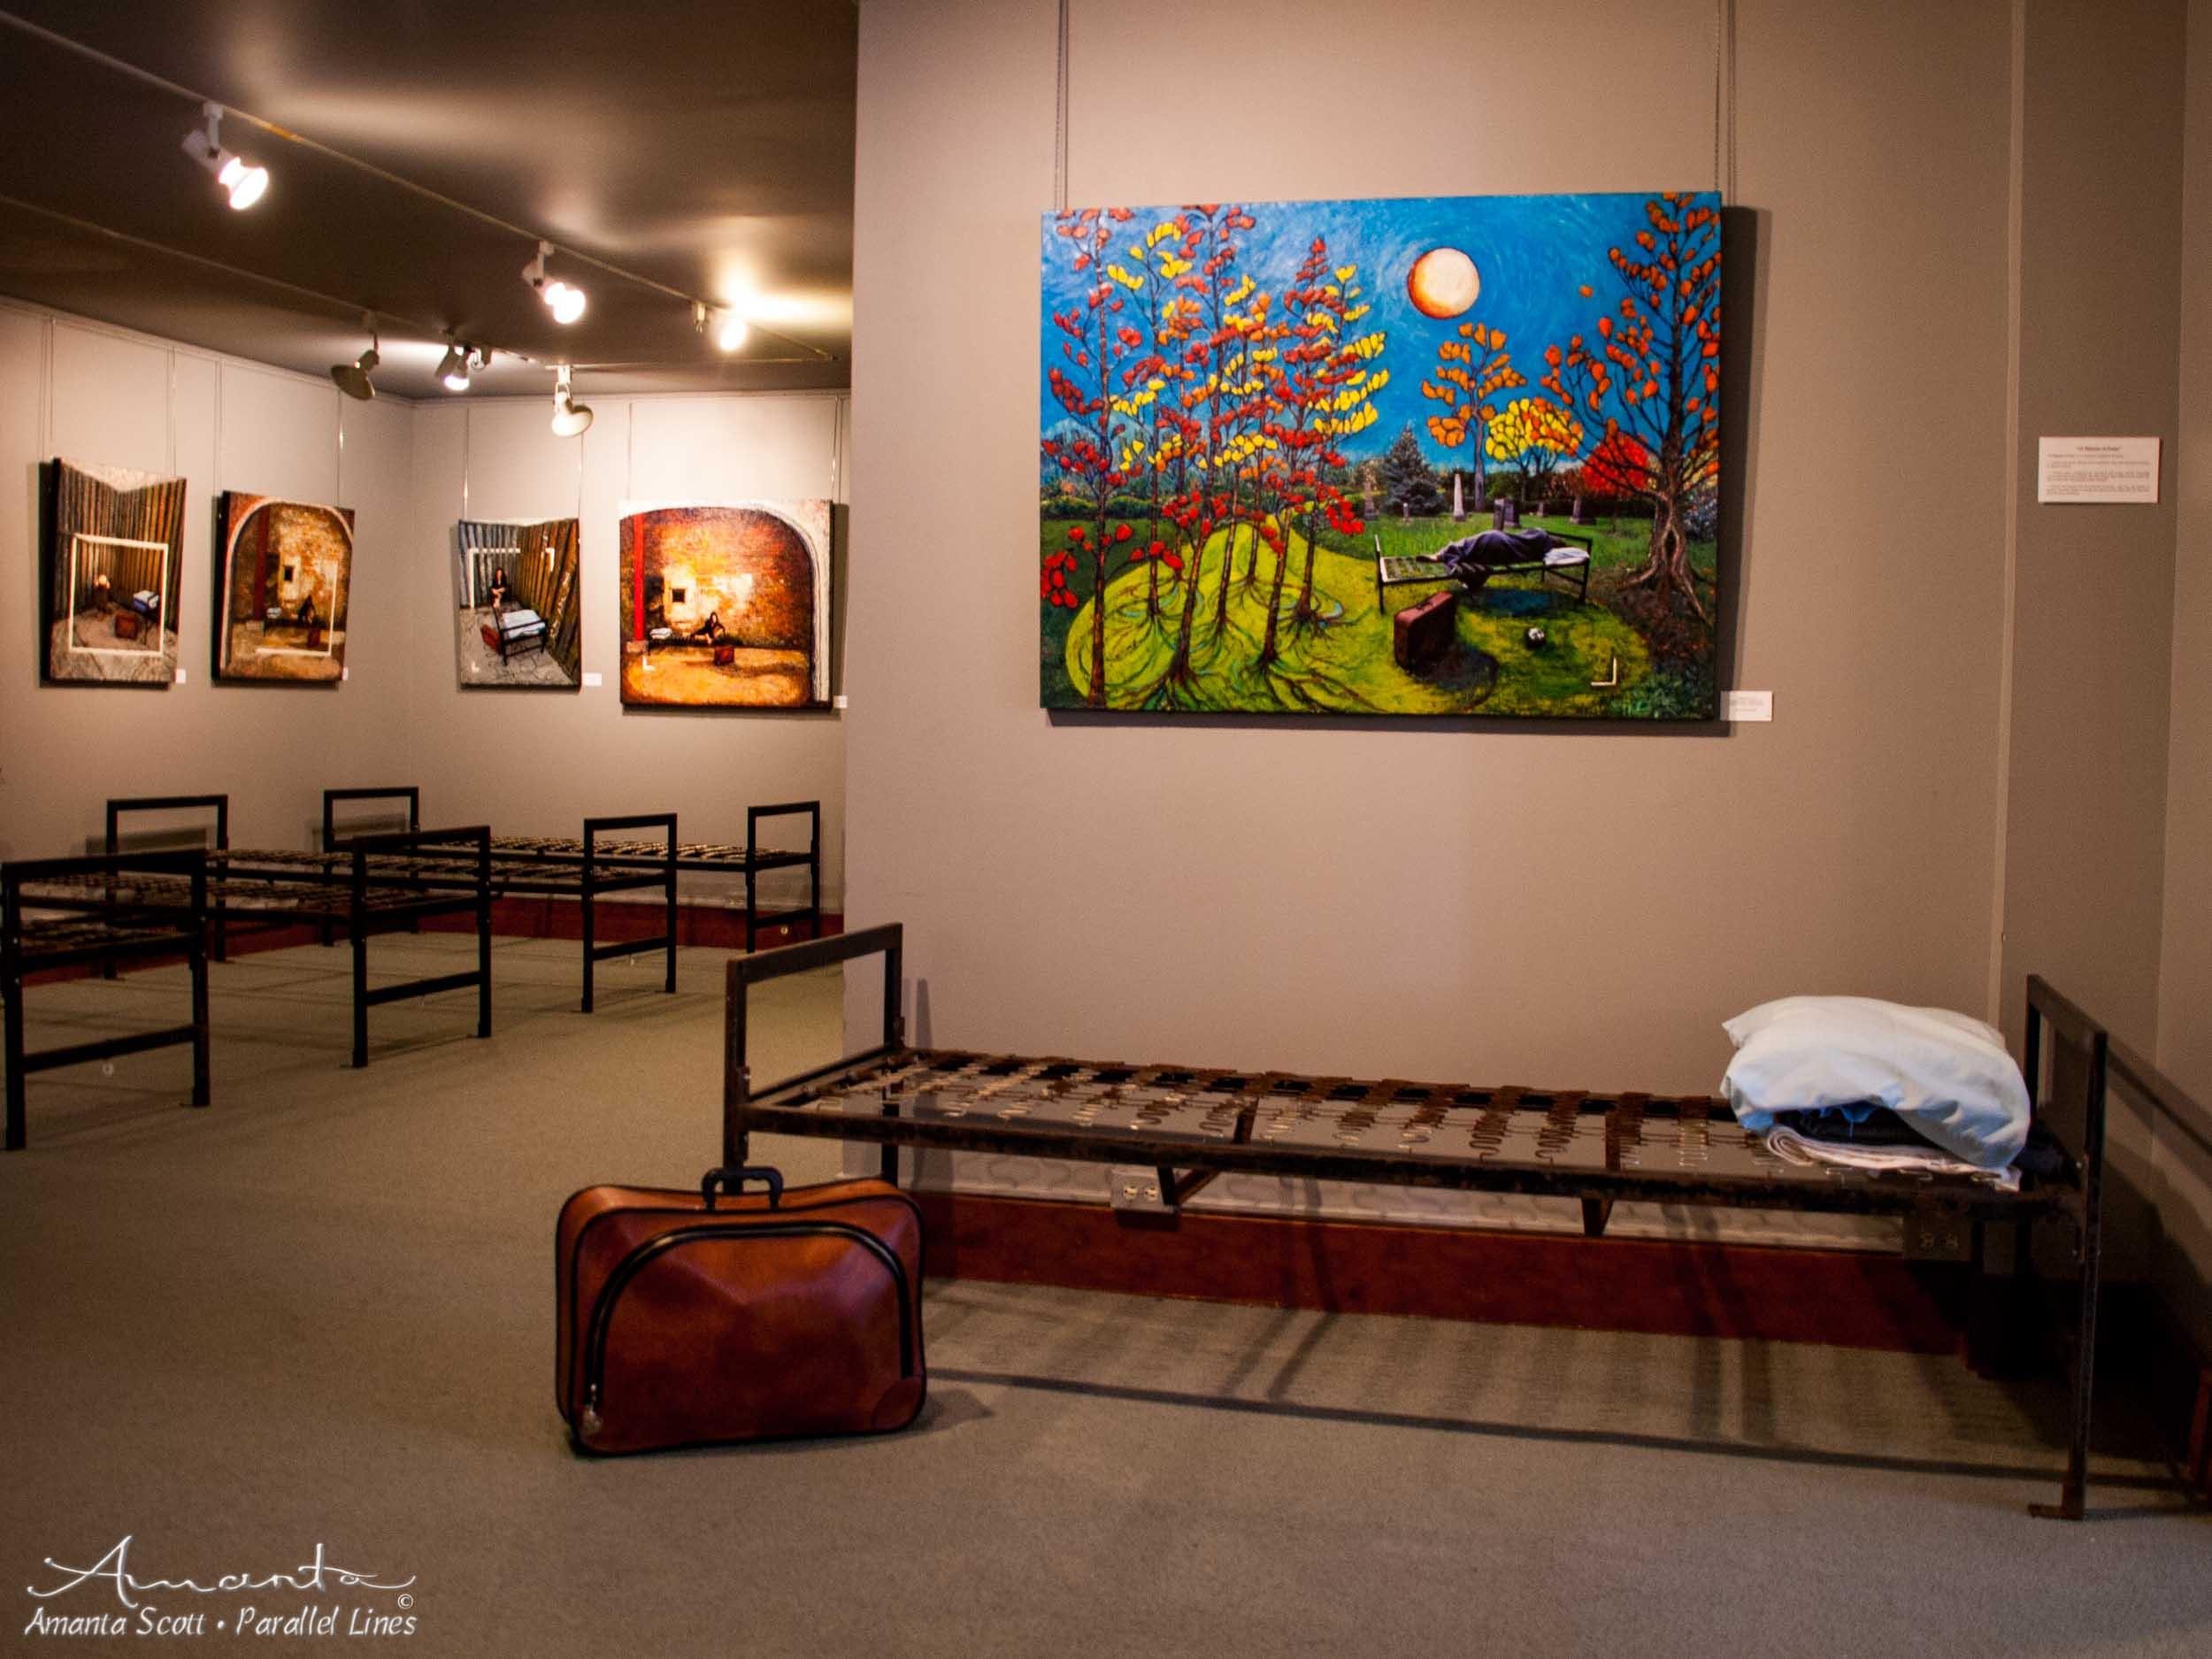 Exhibition-3284152.jpg